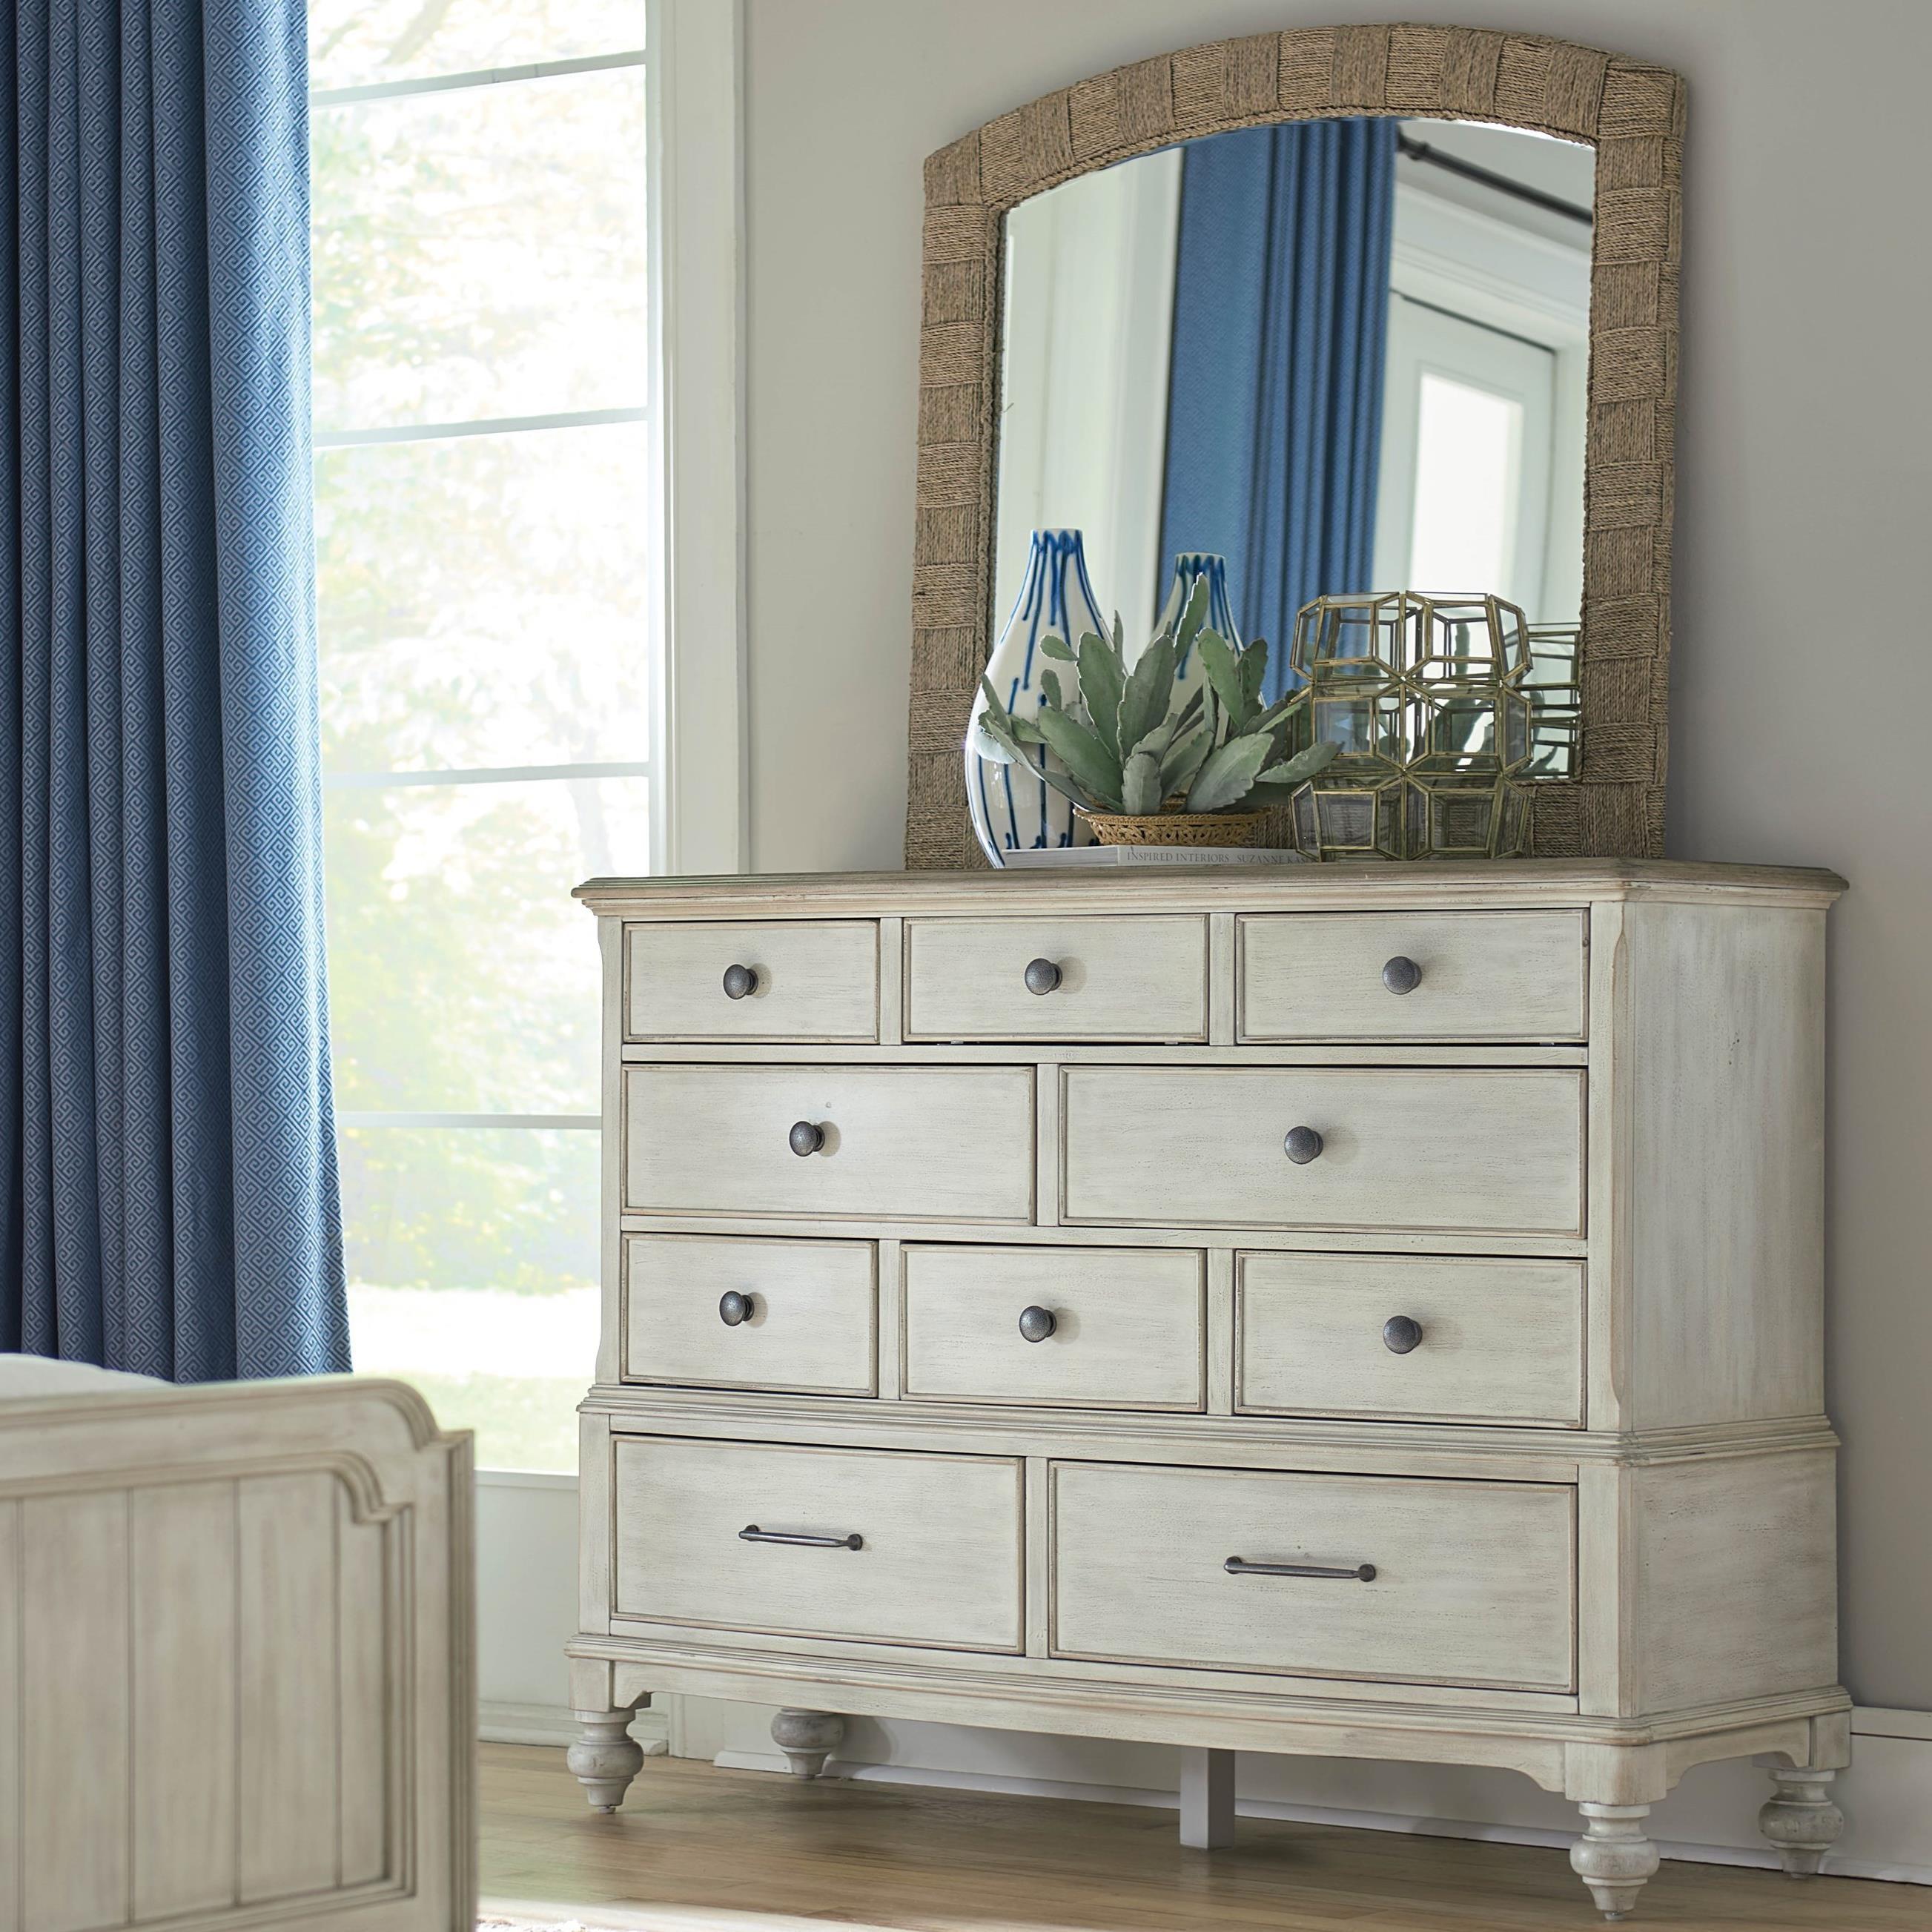 Litchfield Cotswold Dresser Mirror Set by American Drew at Stoney Creek Furniture